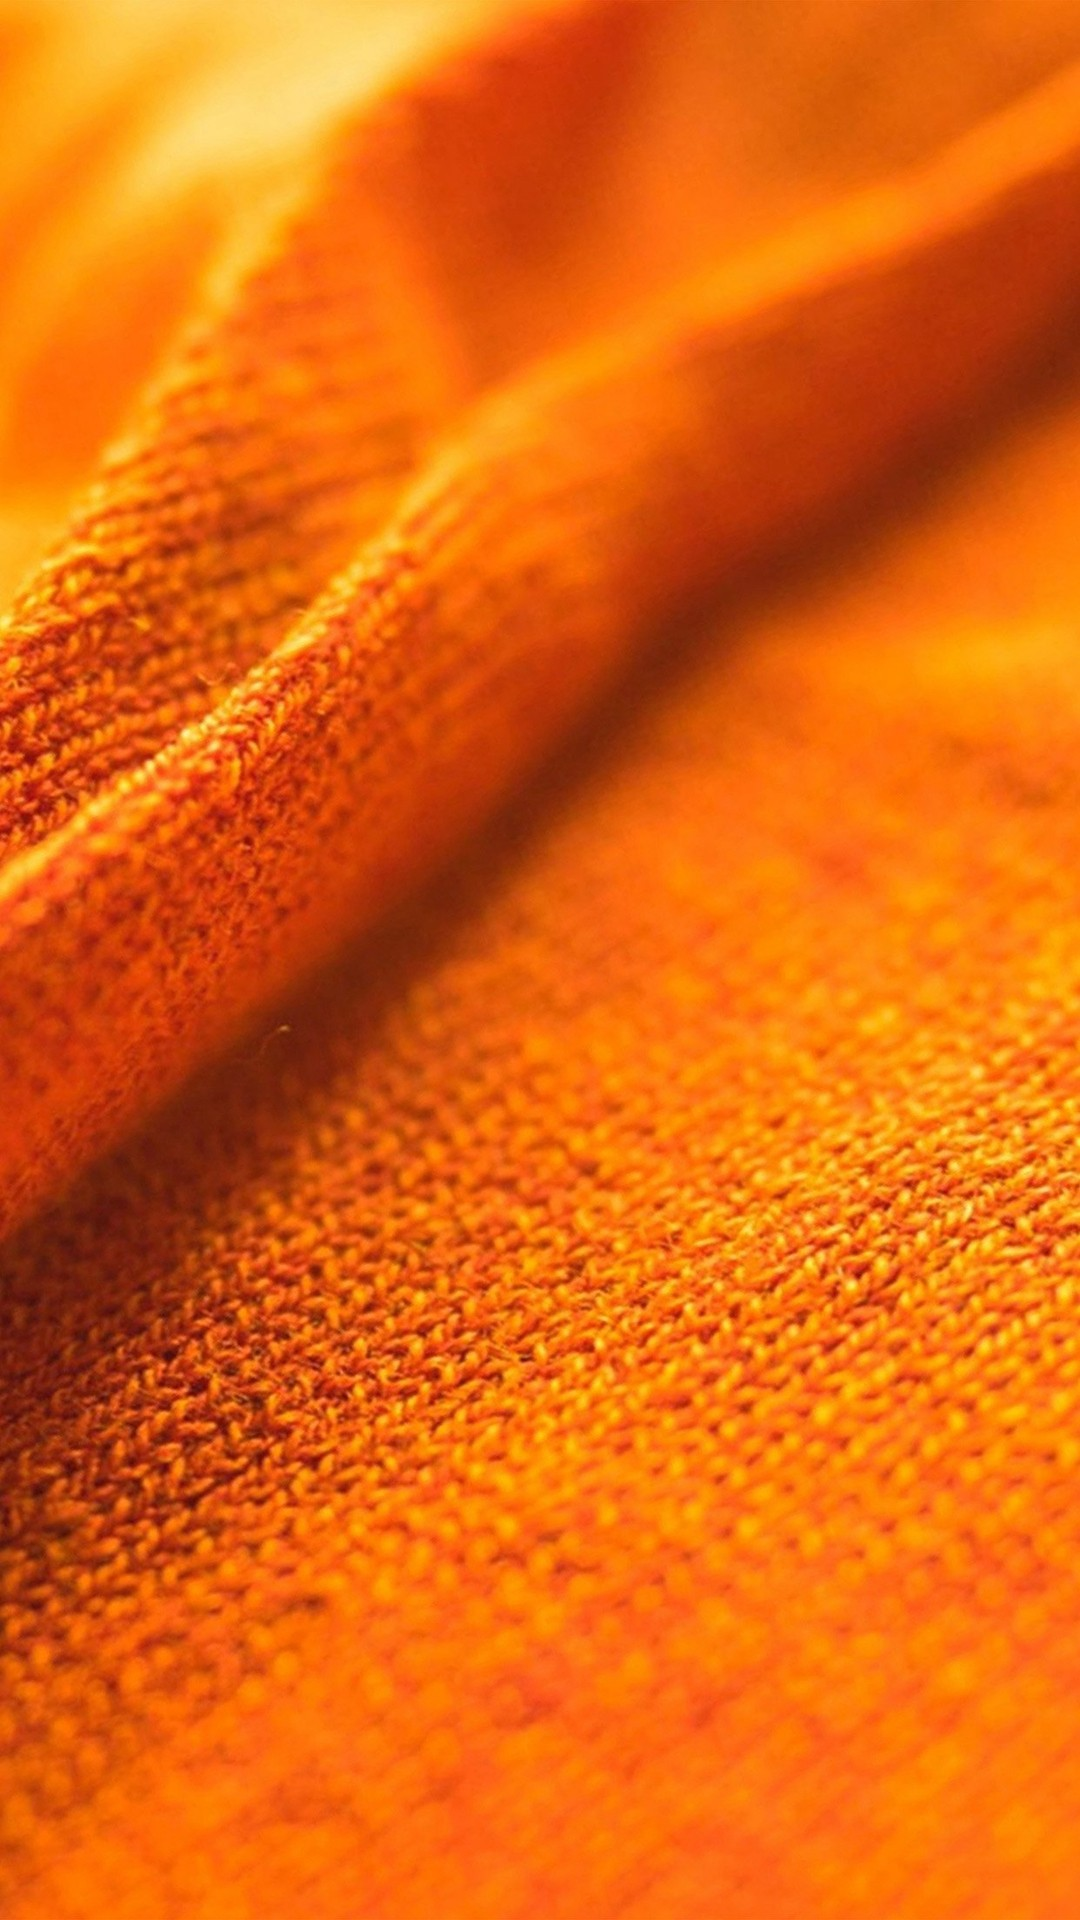 Orange iphone 5 wallpaper